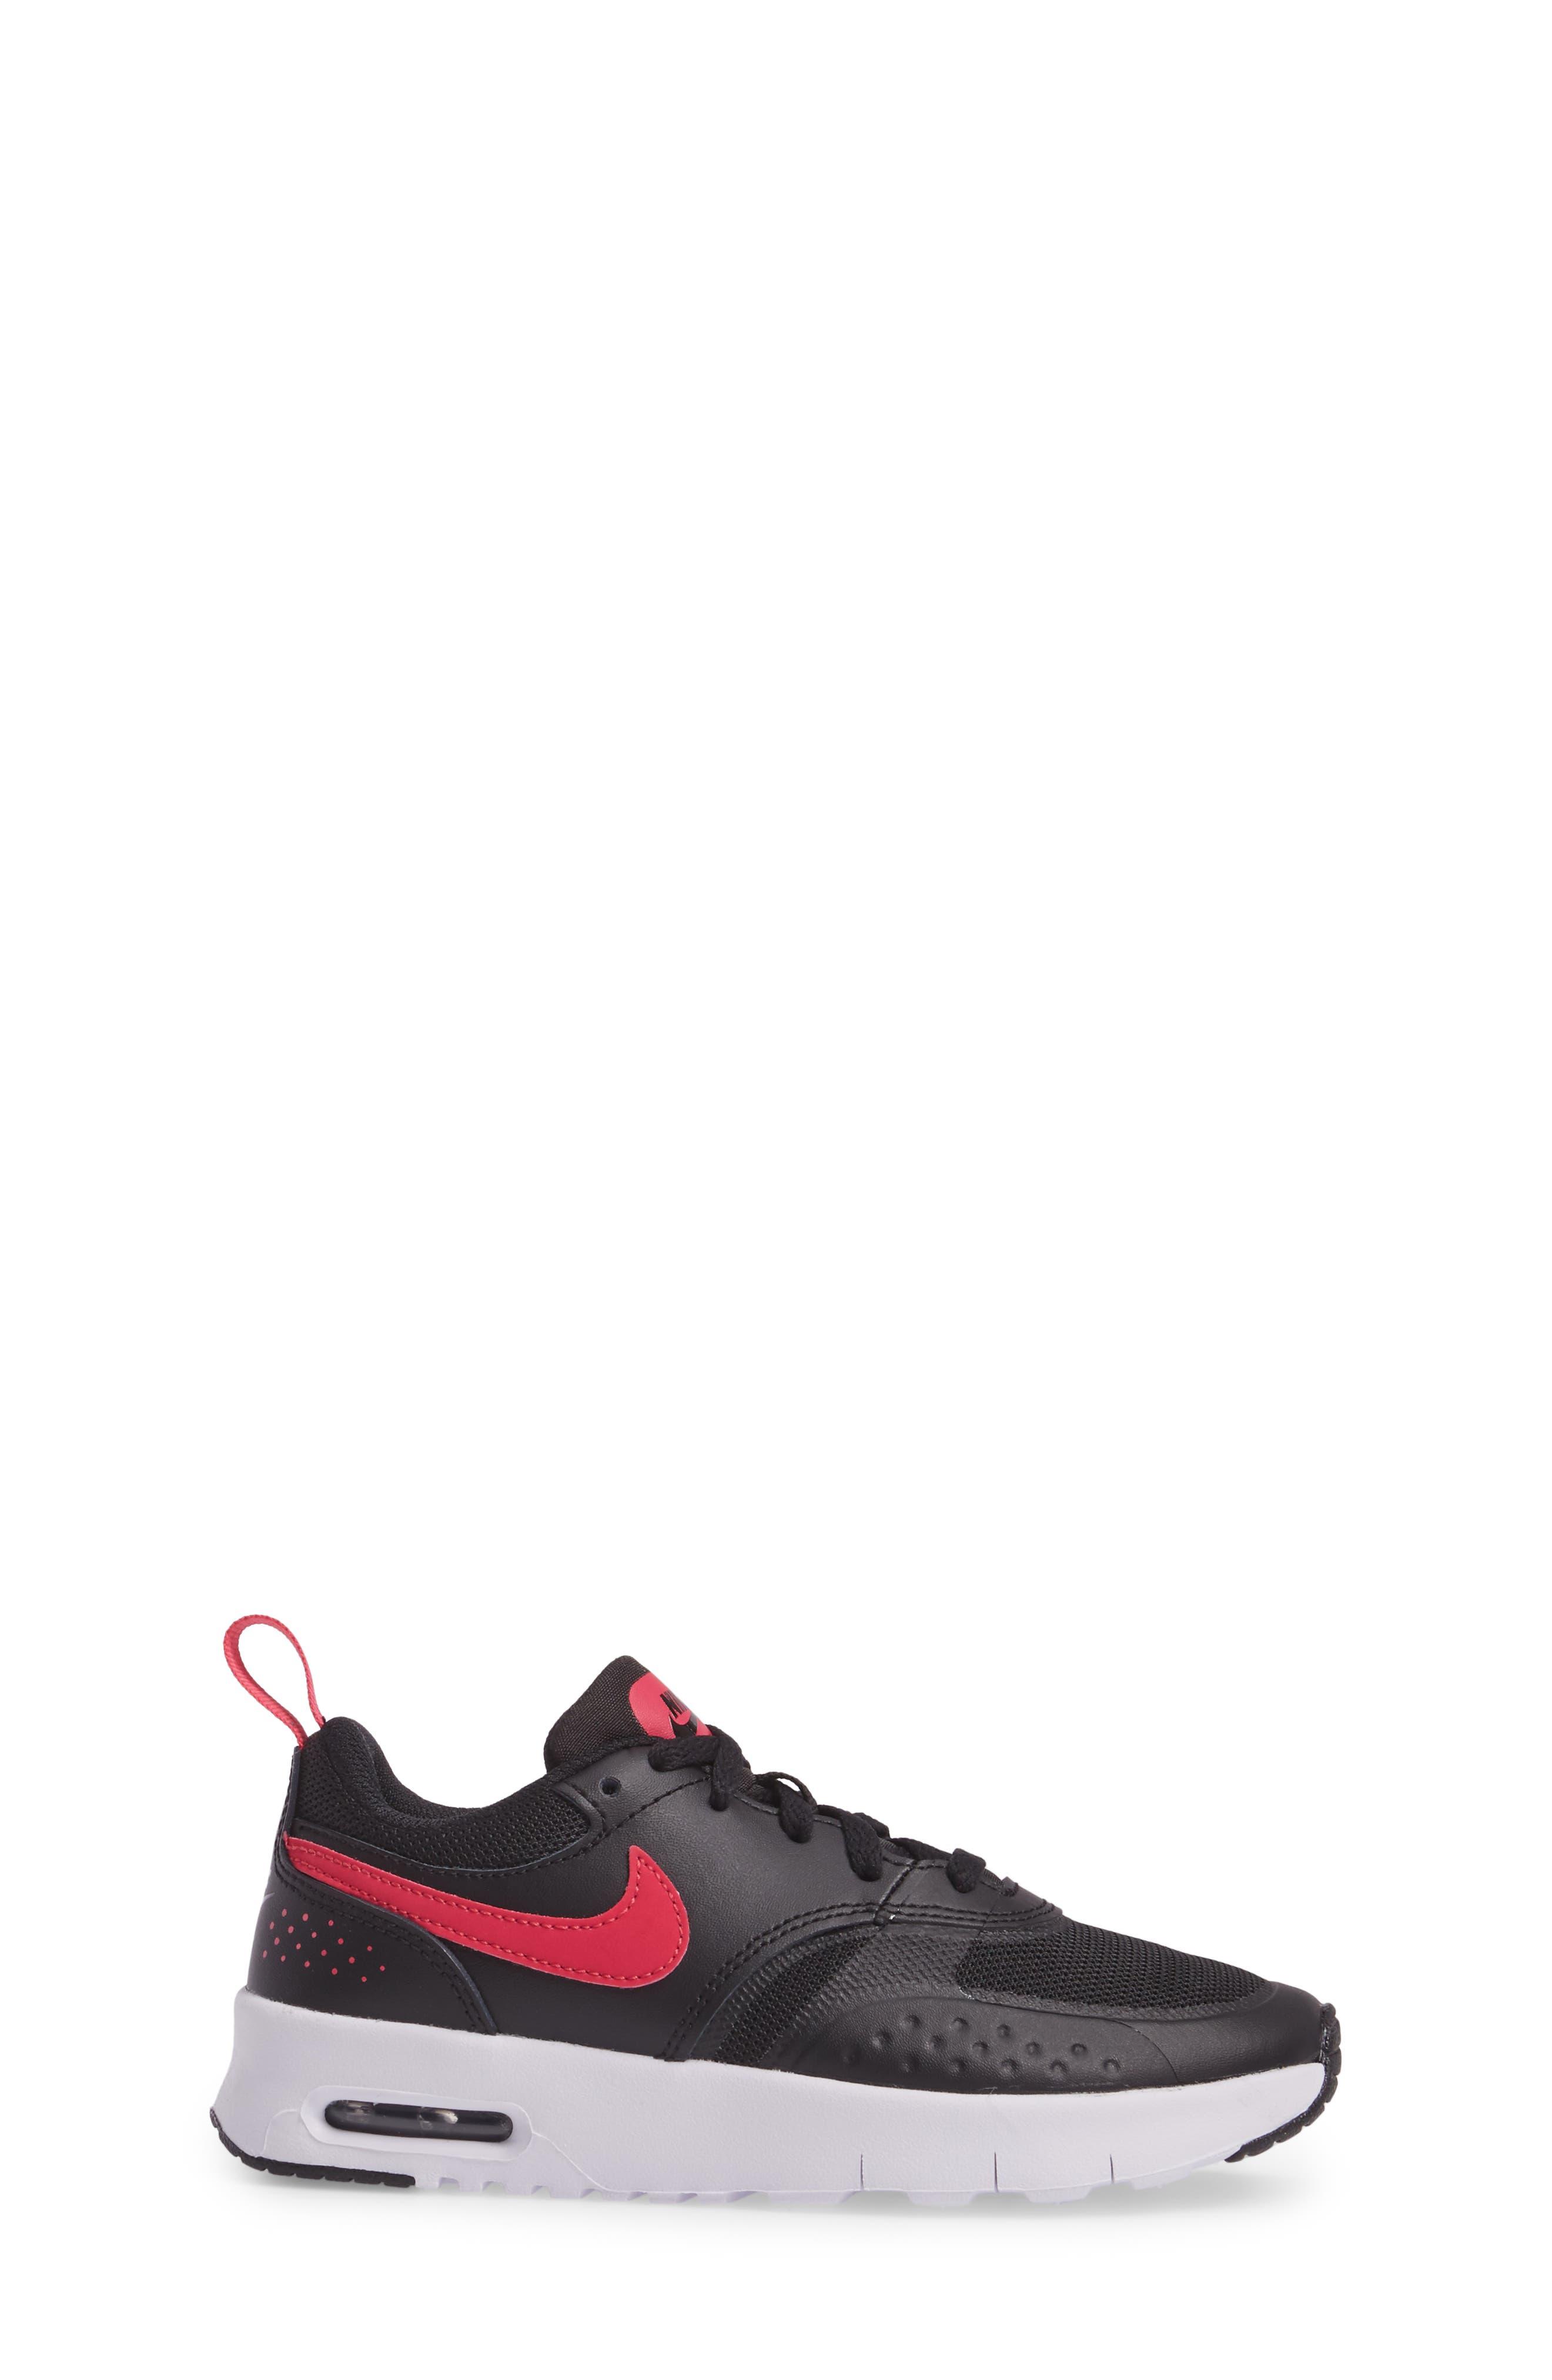 Air Max Vision Sneaker,                             Alternate thumbnail 3, color,                             Black/ Pink